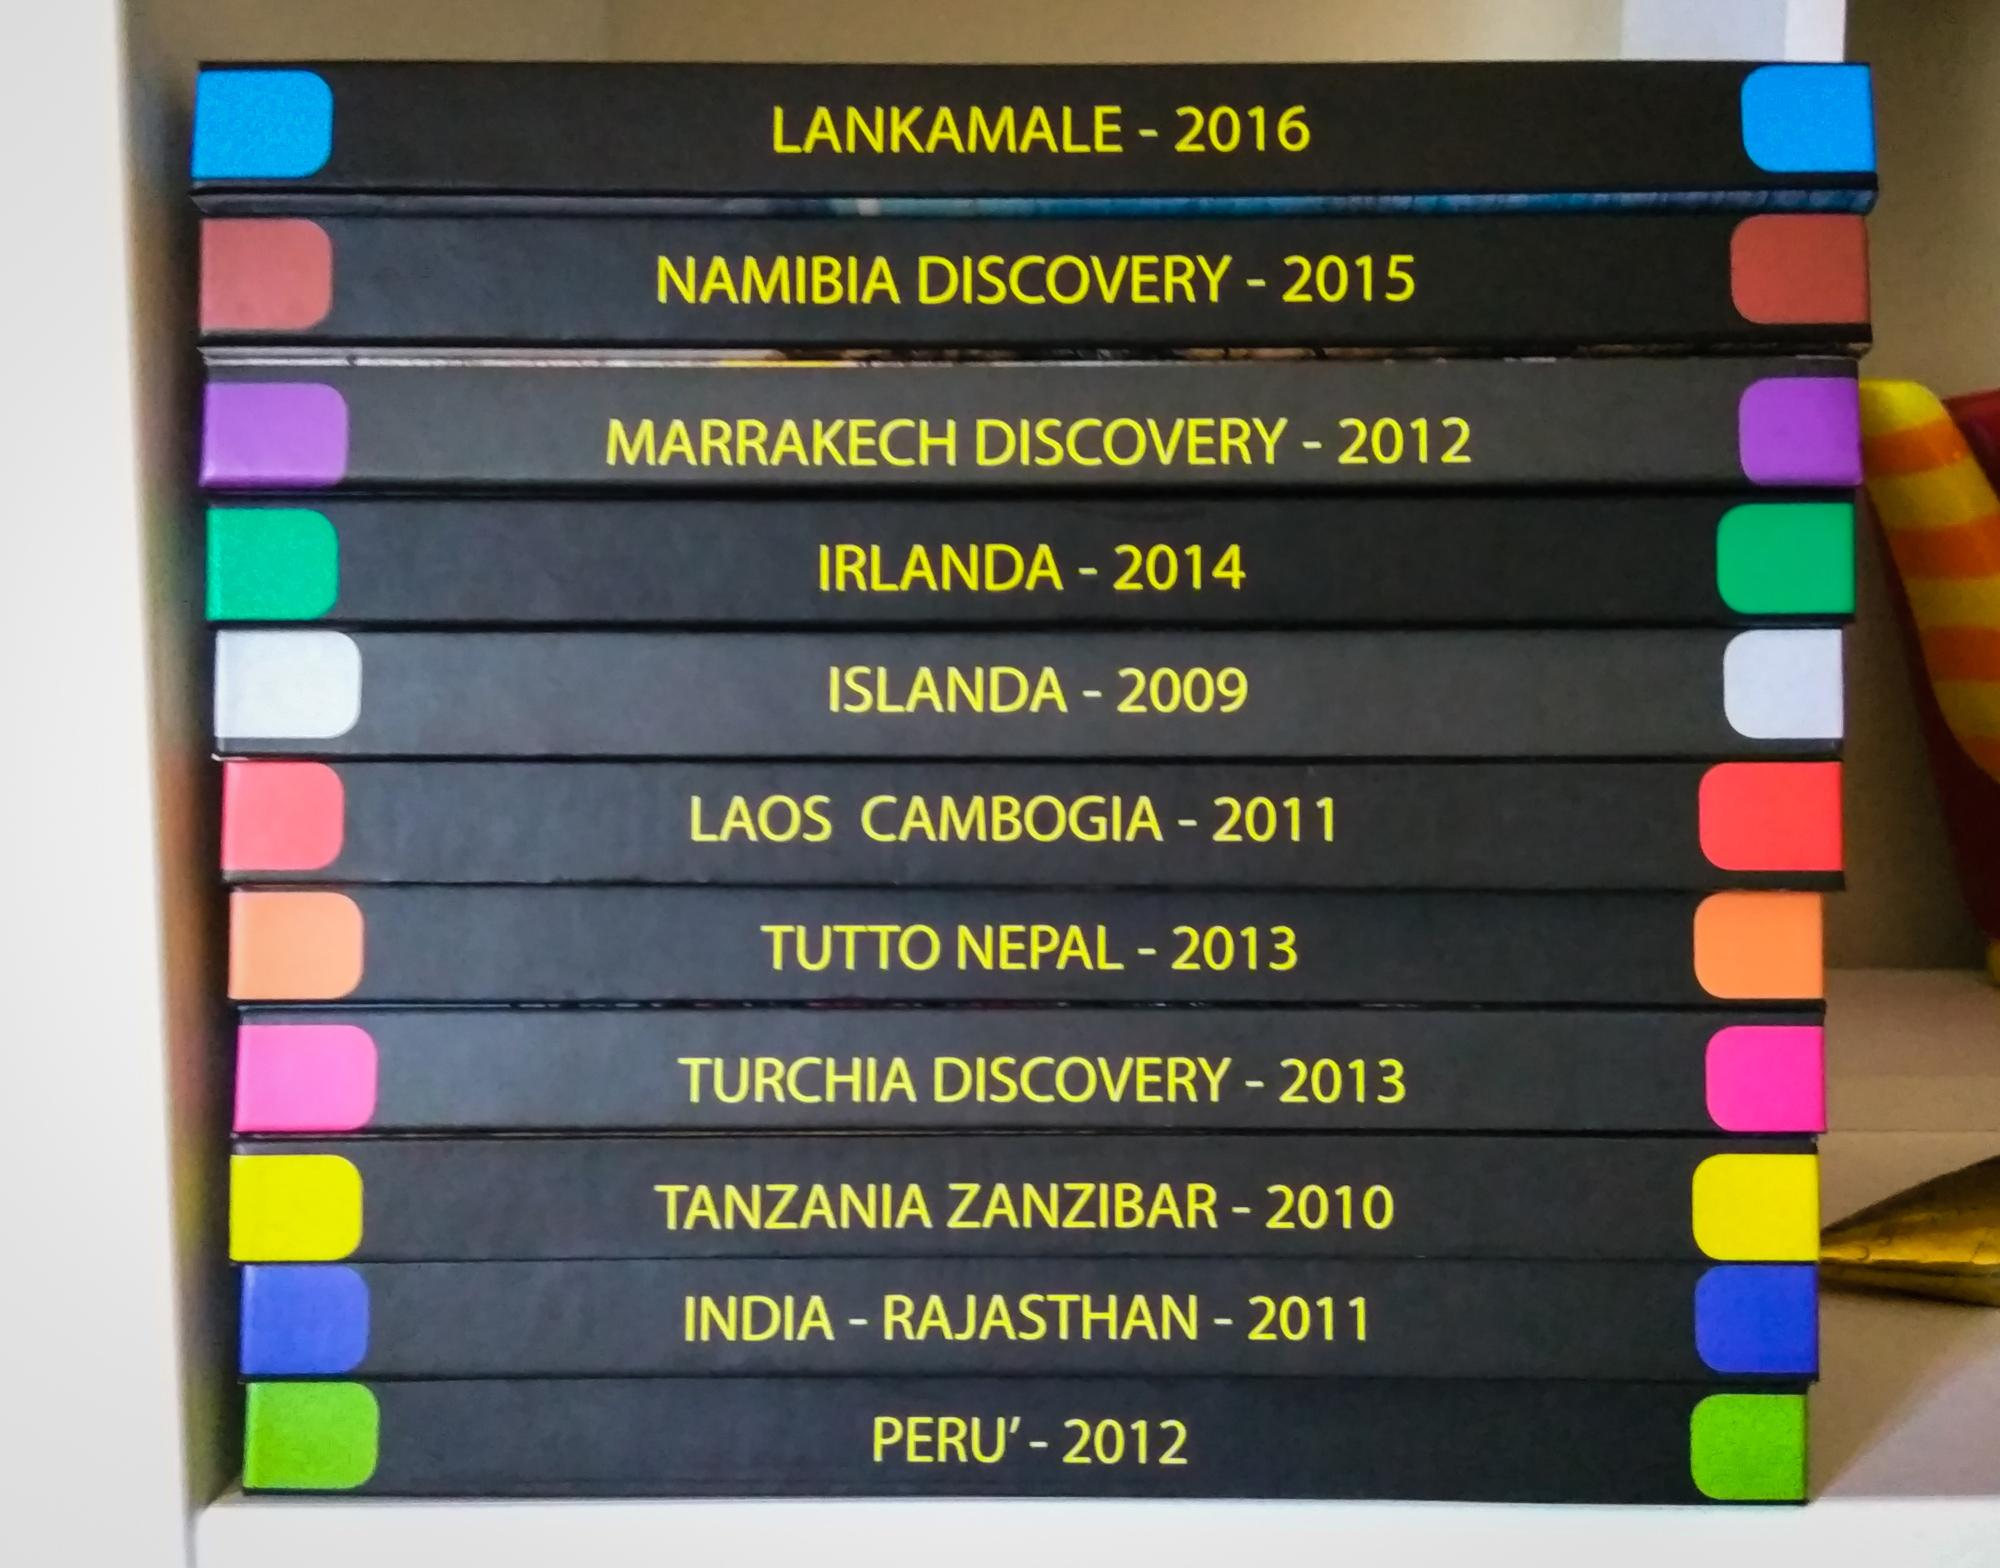 Vlao Editore: Collana viaggi nel mondo – Namibia Discovery e Lankamale